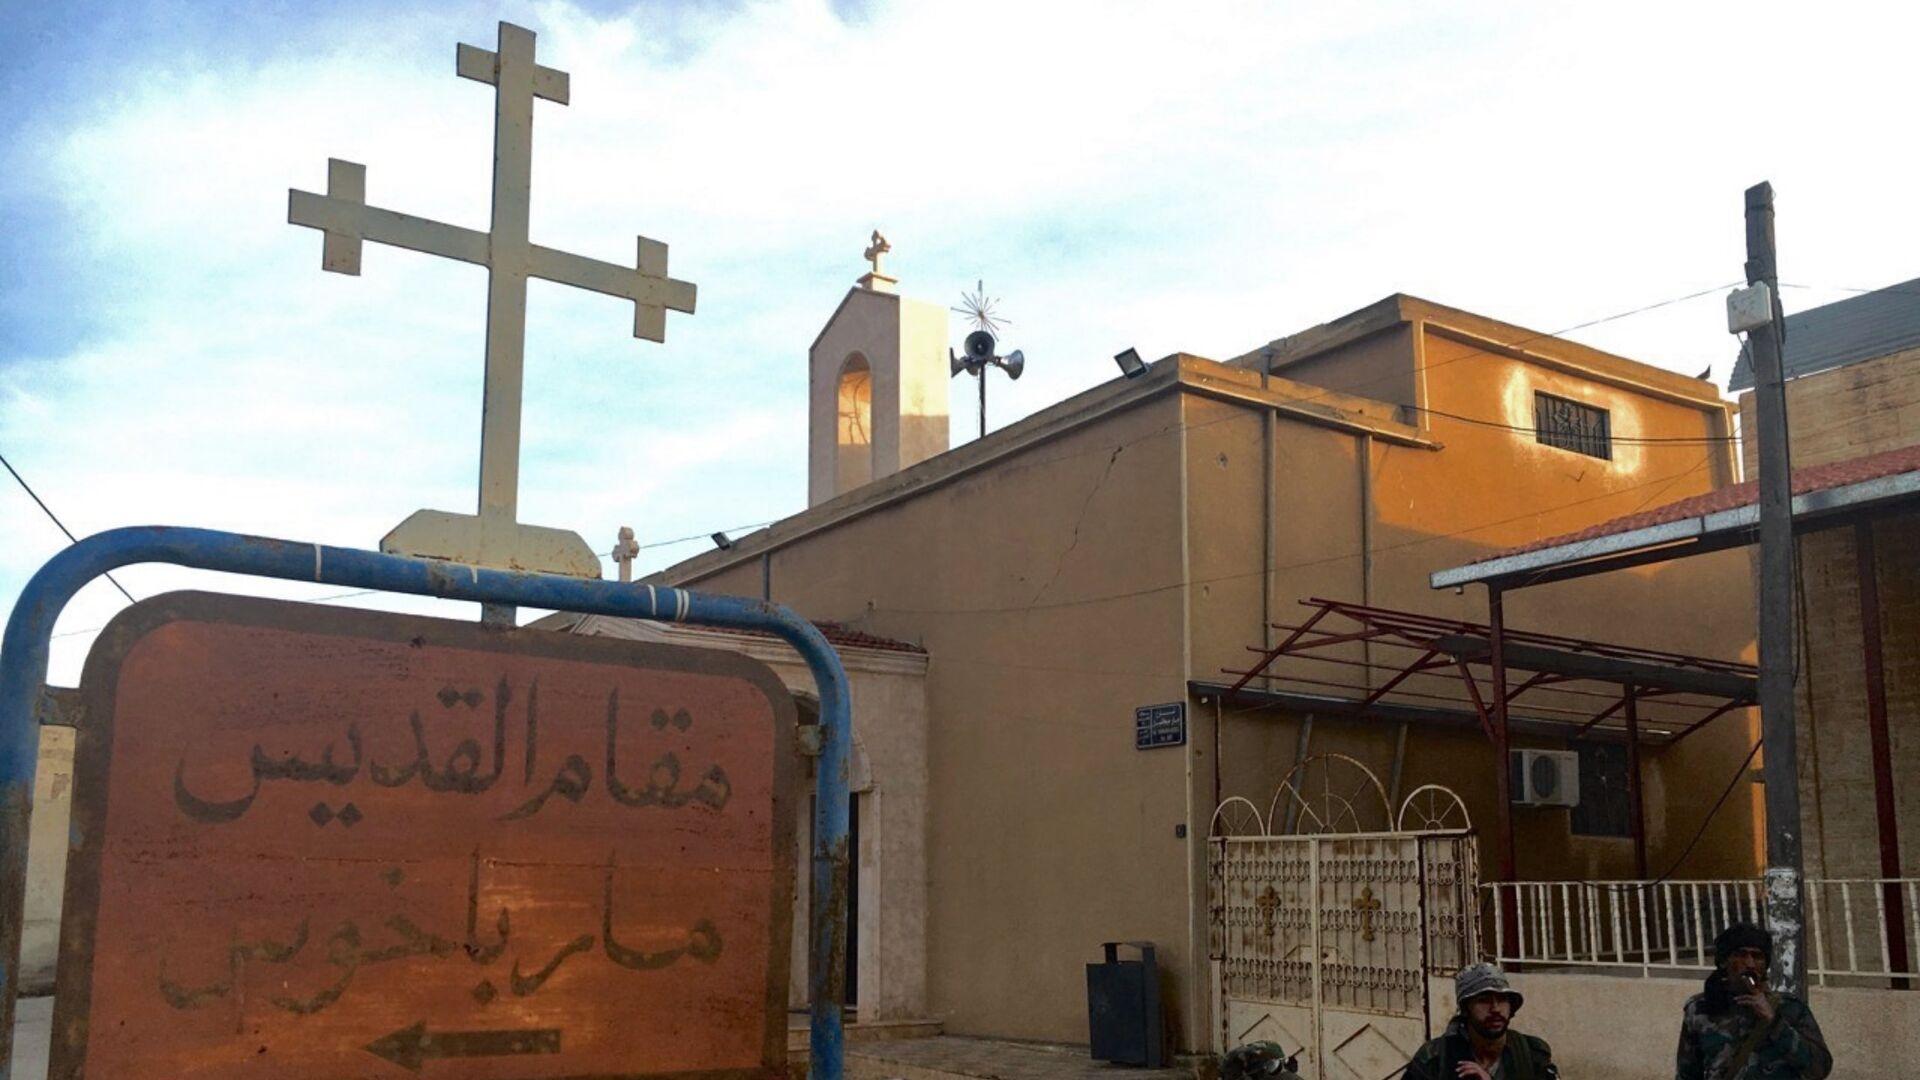 Сирийские ополченцы в христианской деревне Садад, провинция Хомс, Сирия - РИА Новости, 1920, 28.07.2021